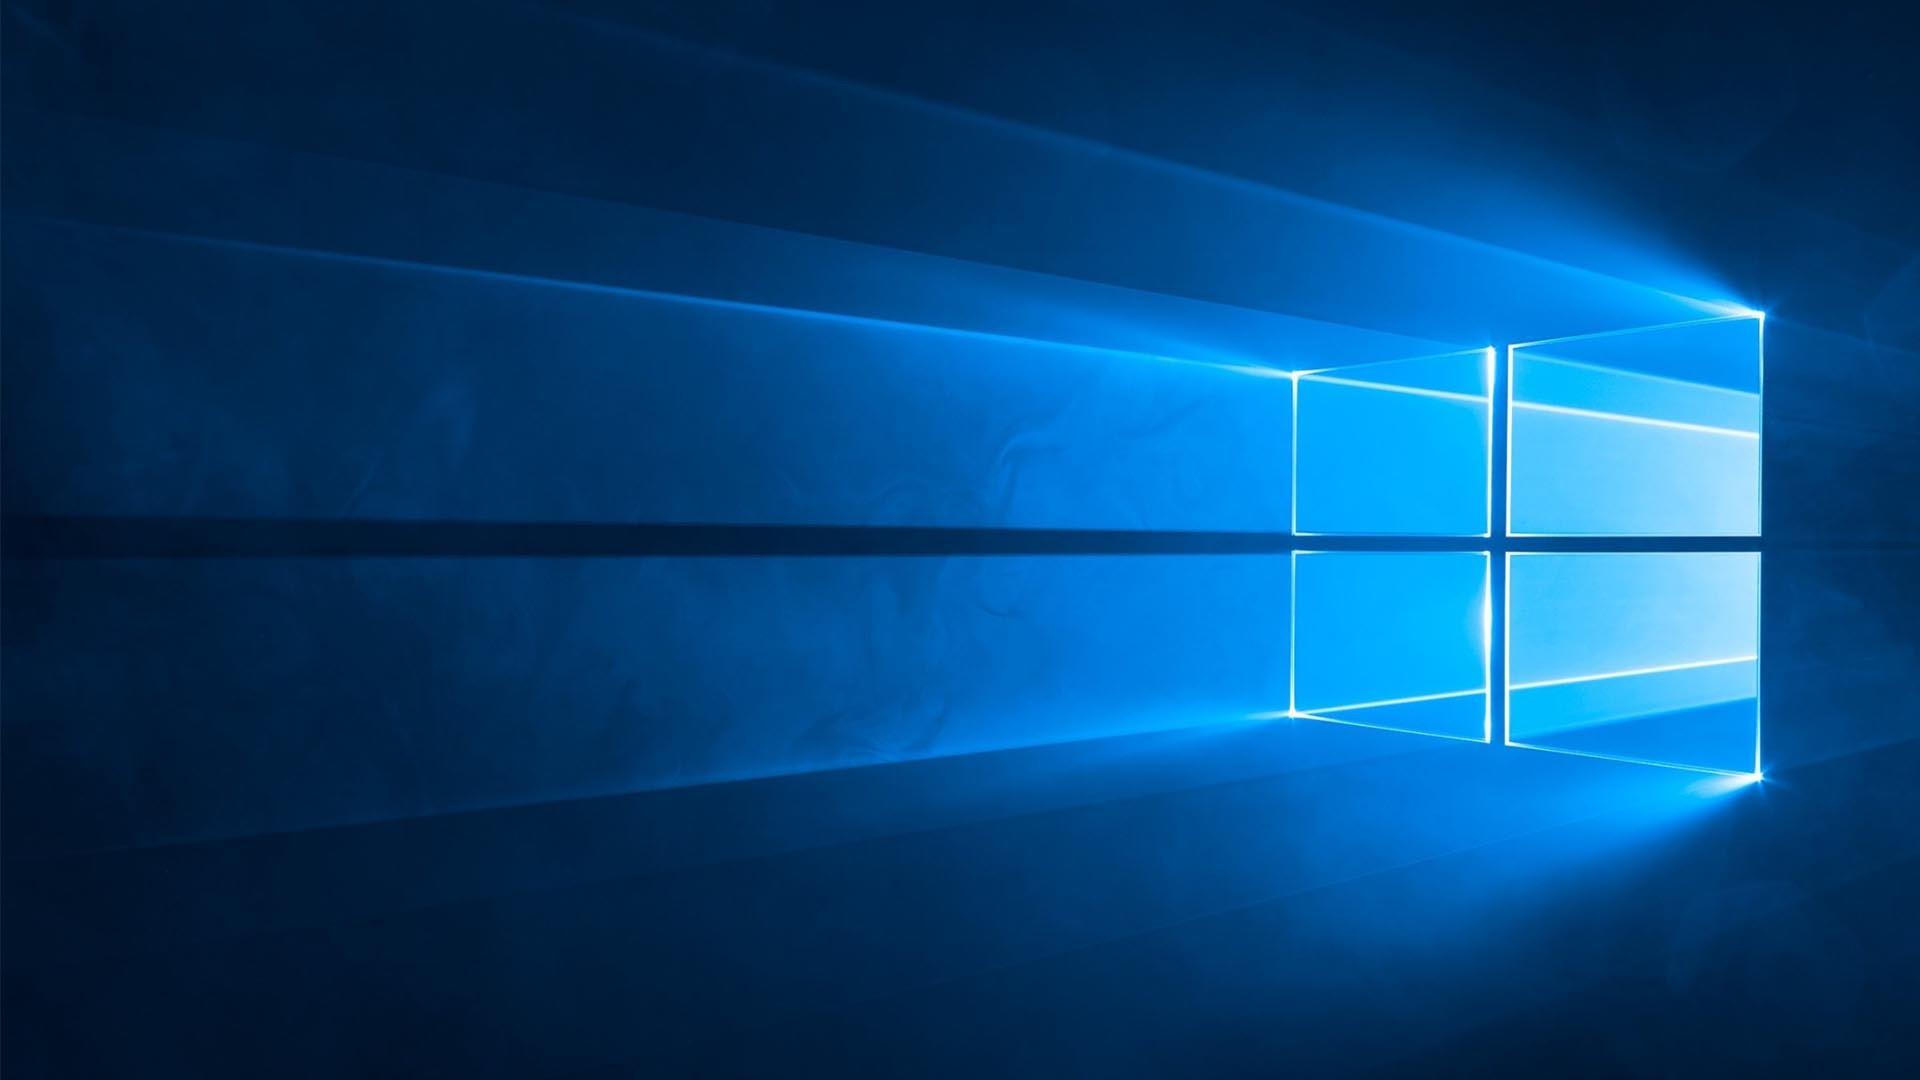 Change Windows 10 Wallpaper